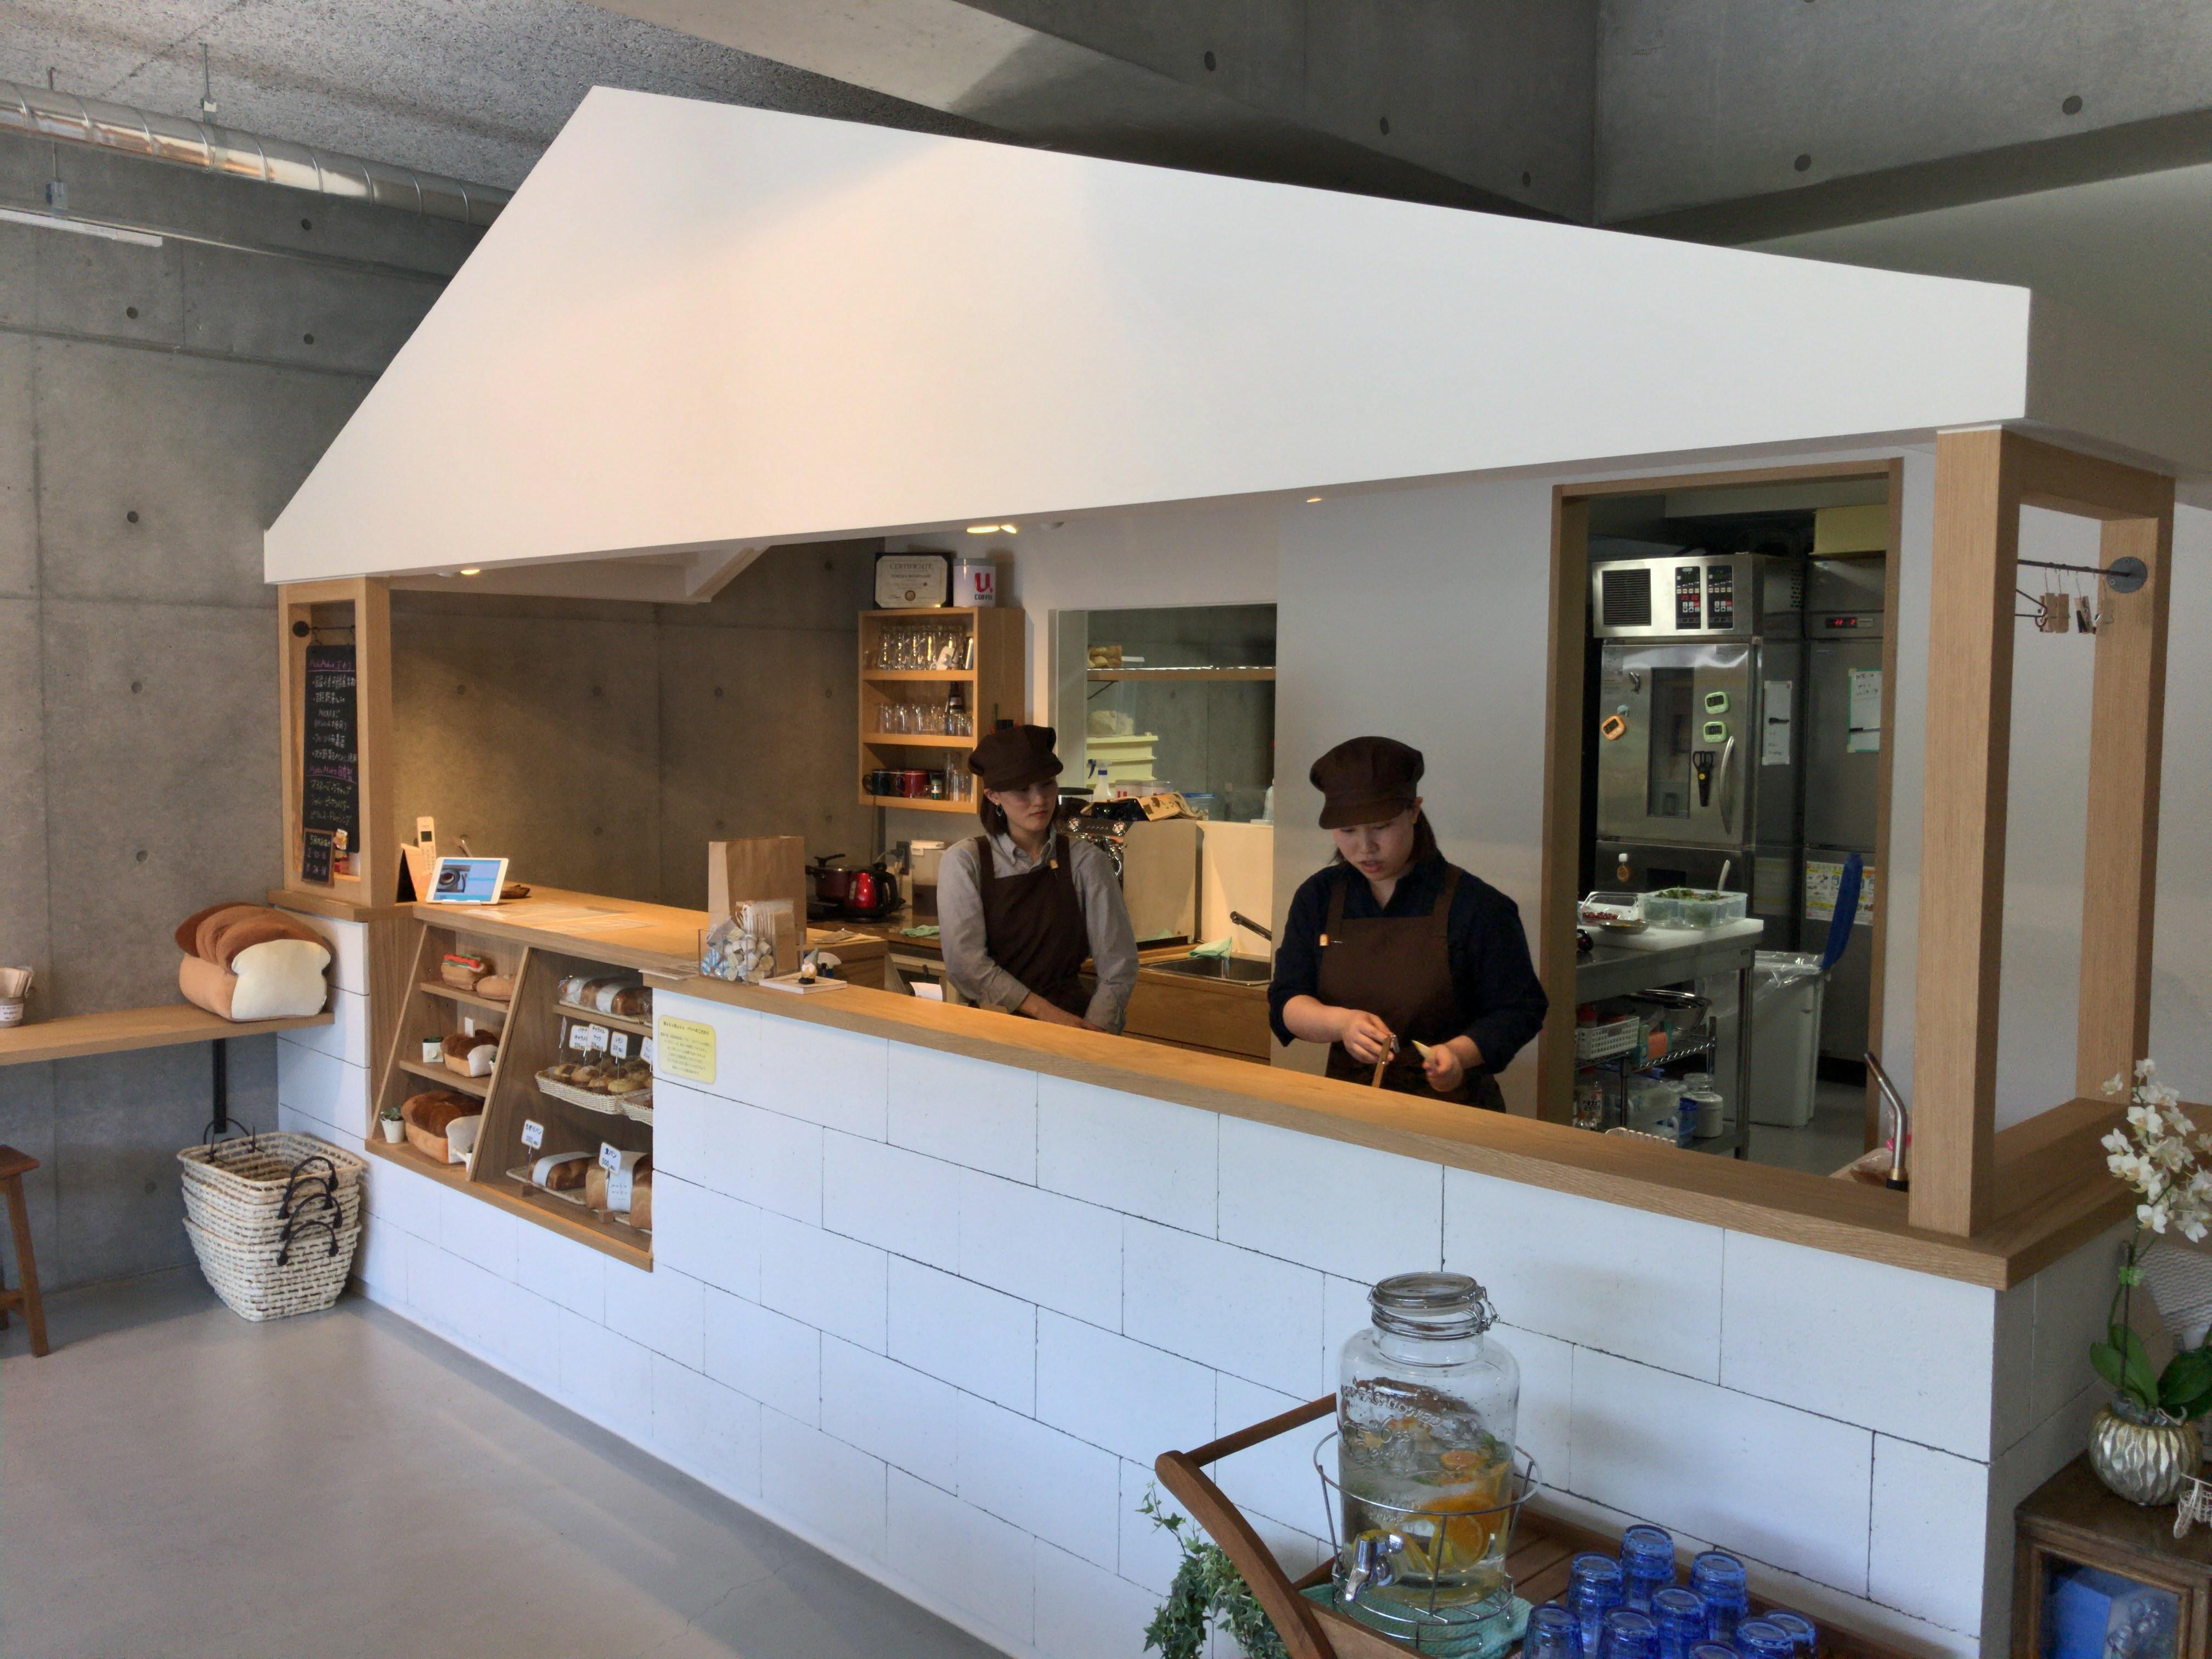 Moko Moko home made bakery